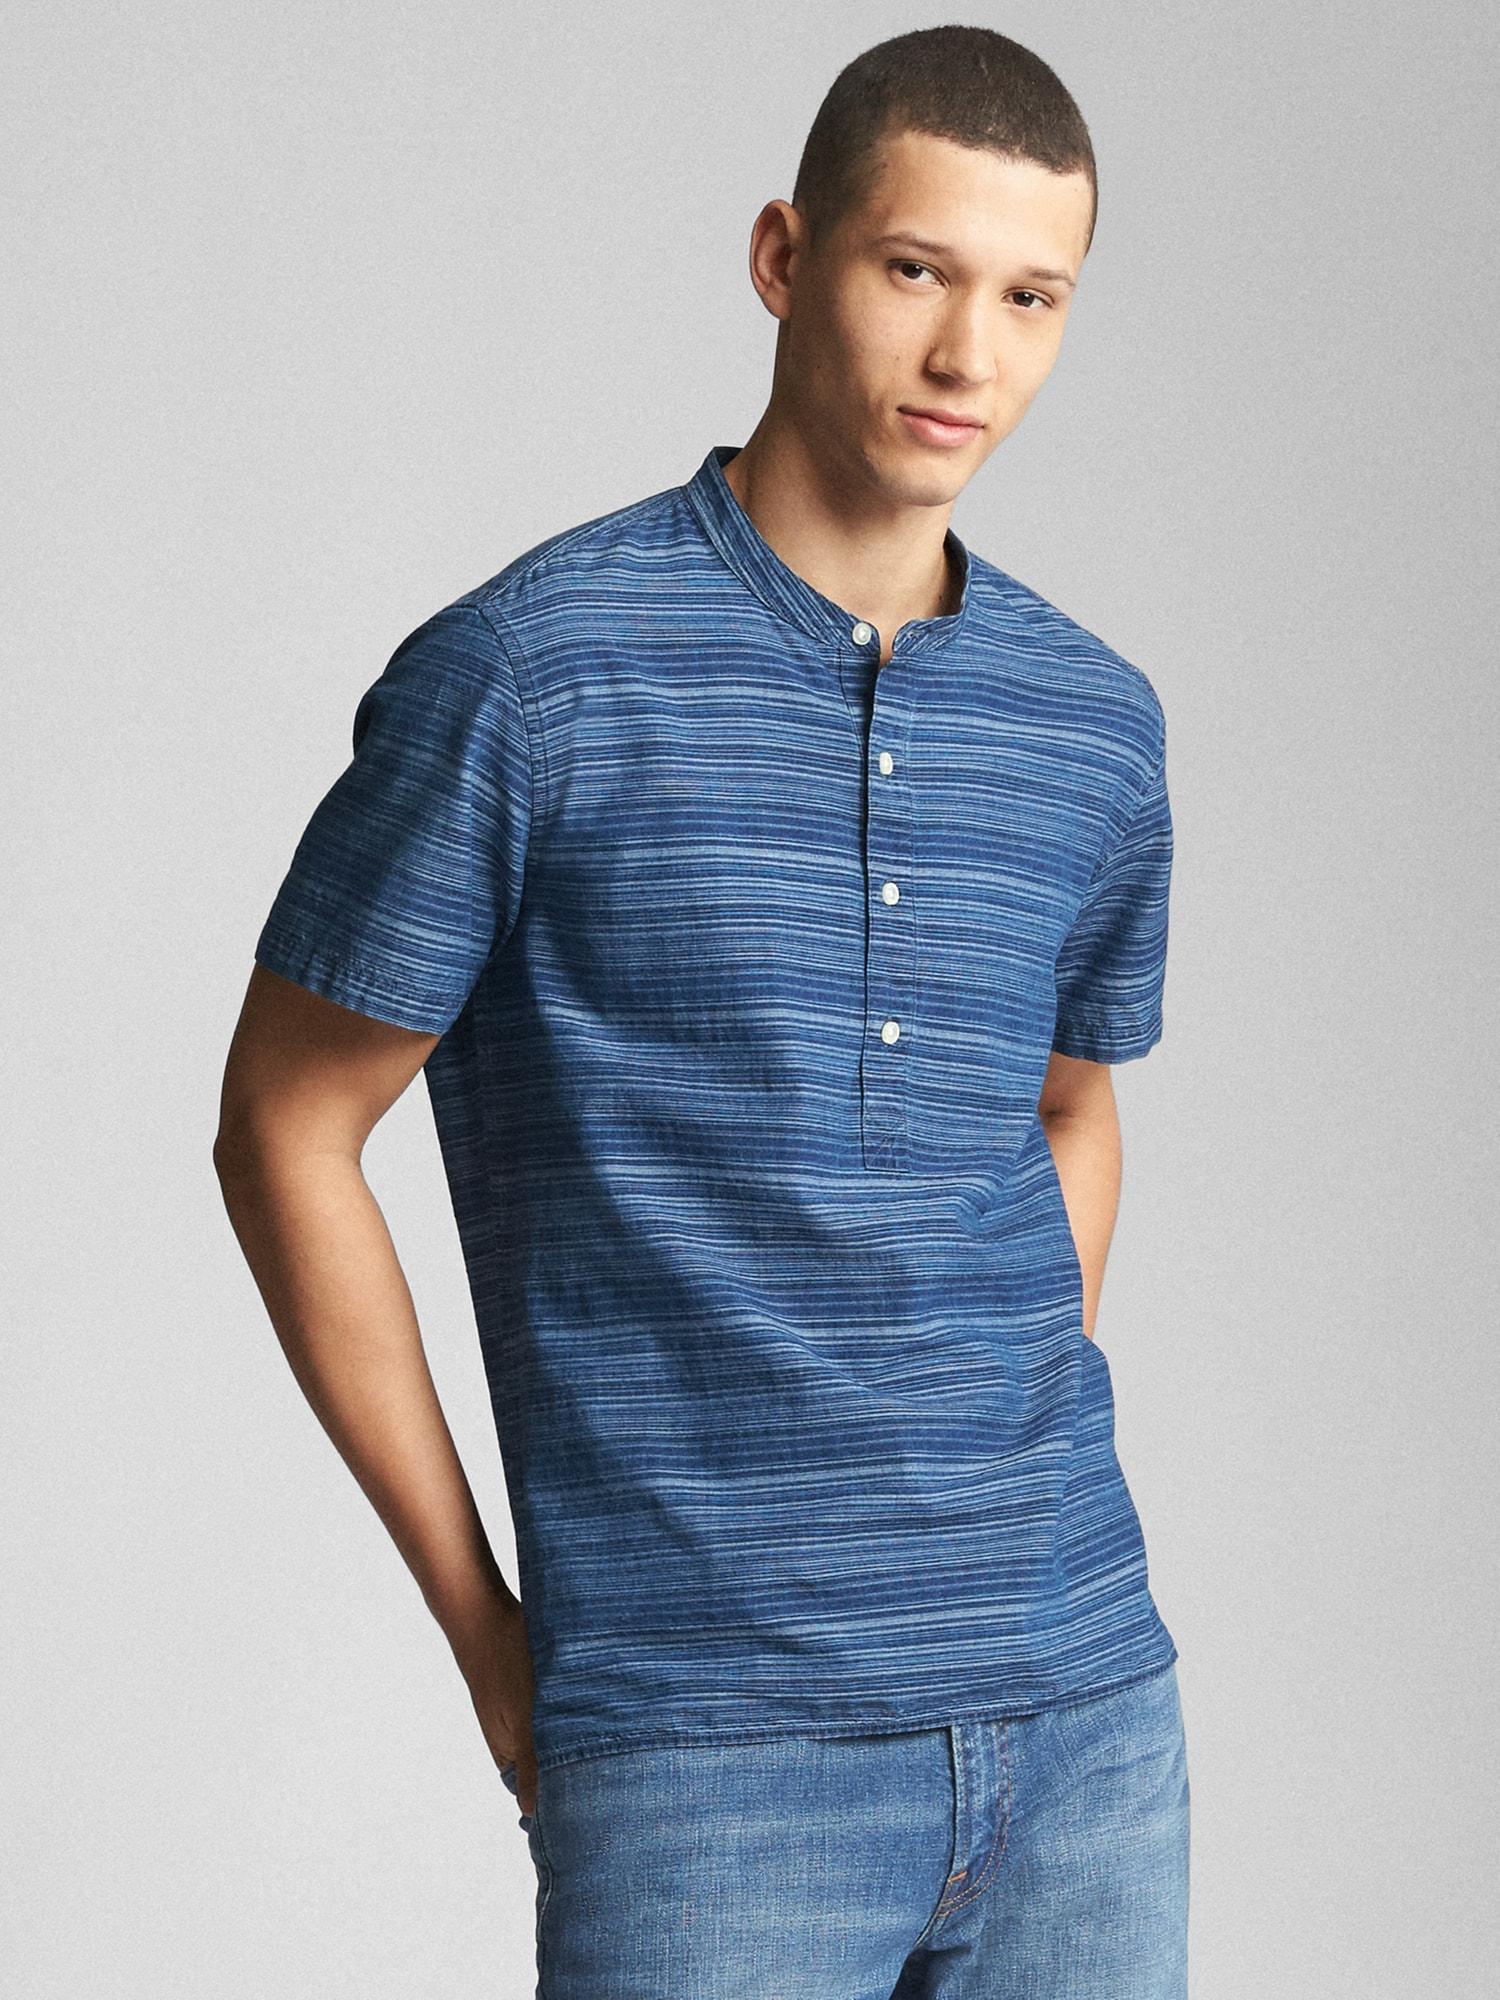 644b199c964 Gap Slim Fit Denim Shirt - Cotswold Hire